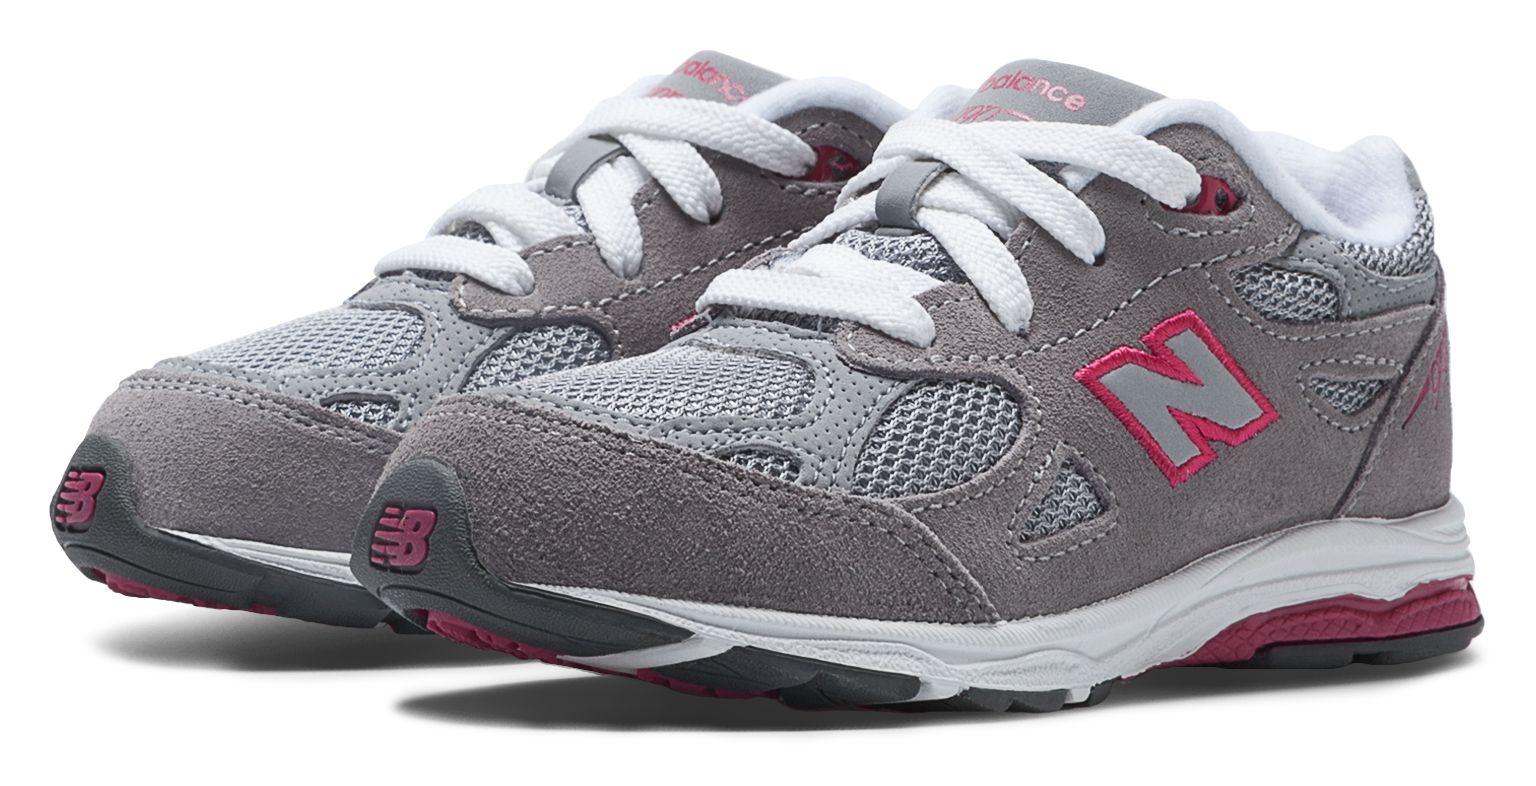 New Balance Kids 990v 3 Shoes Grey